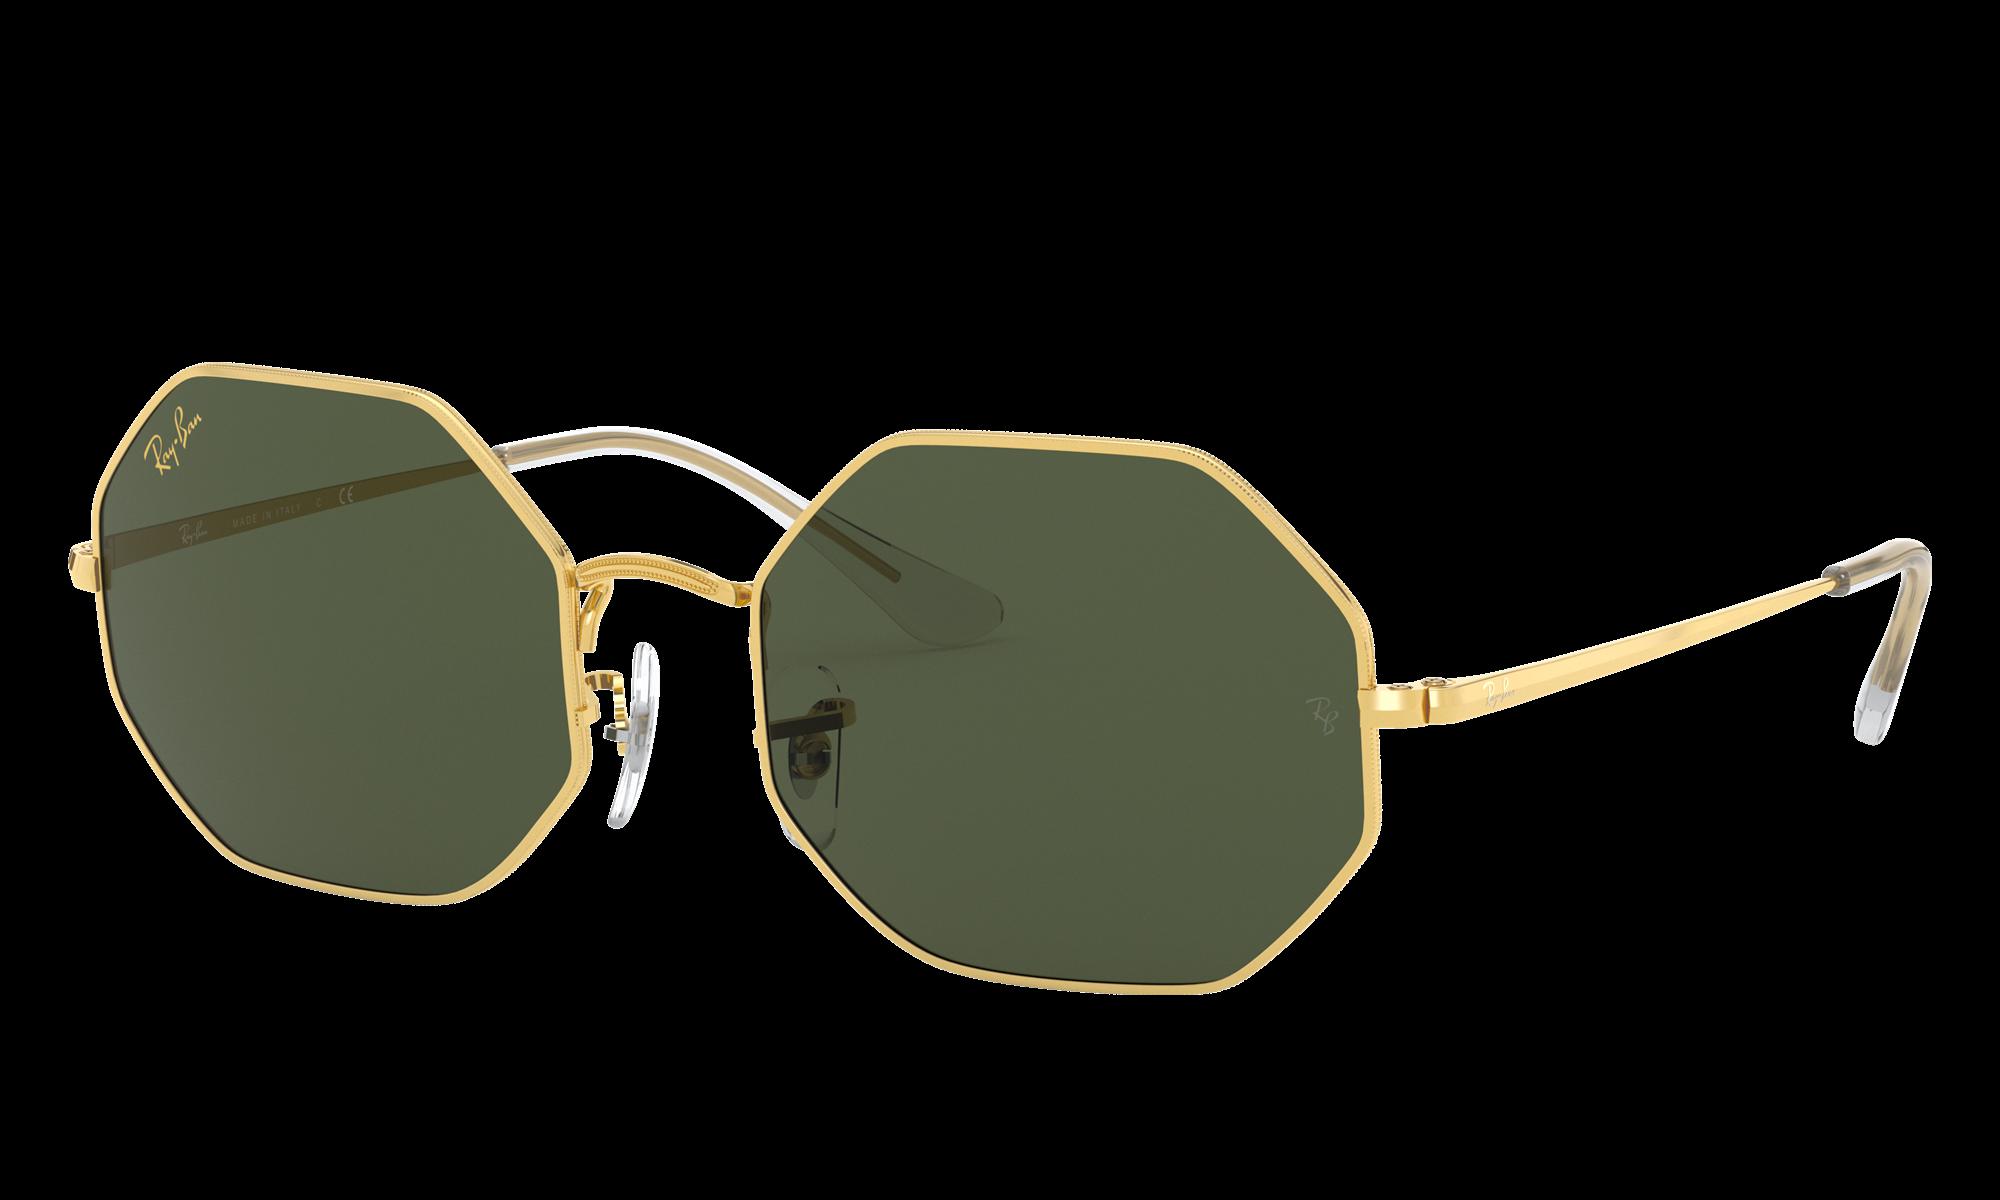 1960s Sunglasses | 70s Sunglasses, 70s Glasses Ray-Ban Unisex Octagon 1972 Legend Gold Gold Size Standard $154.00 AT vintagedancer.com